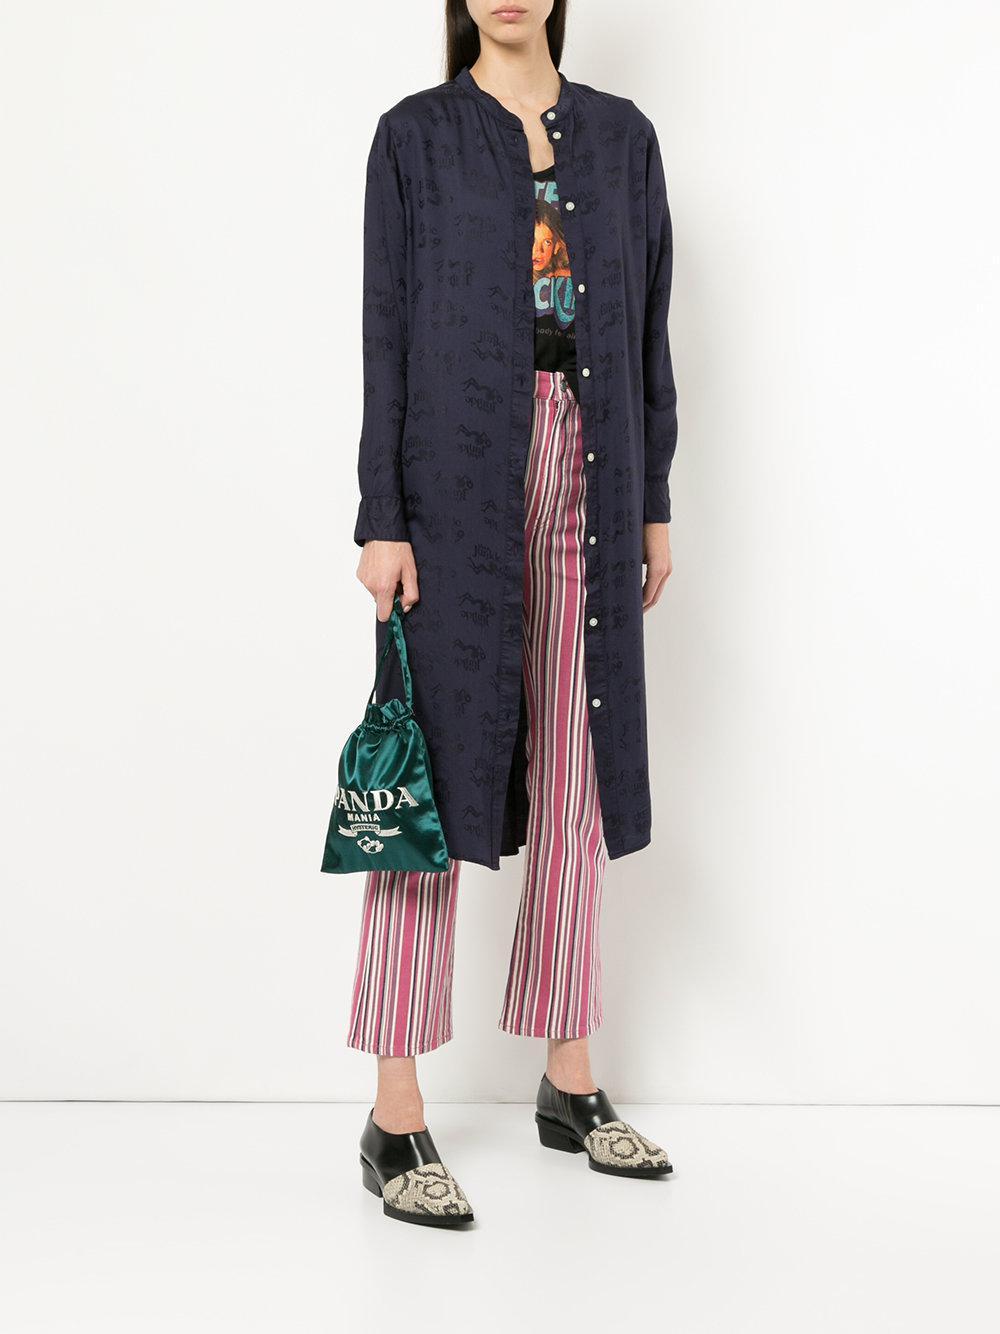 Lyst Hysteric Glamour Panda Mania Drawstring Clutch Bag In Green View Fullscreen